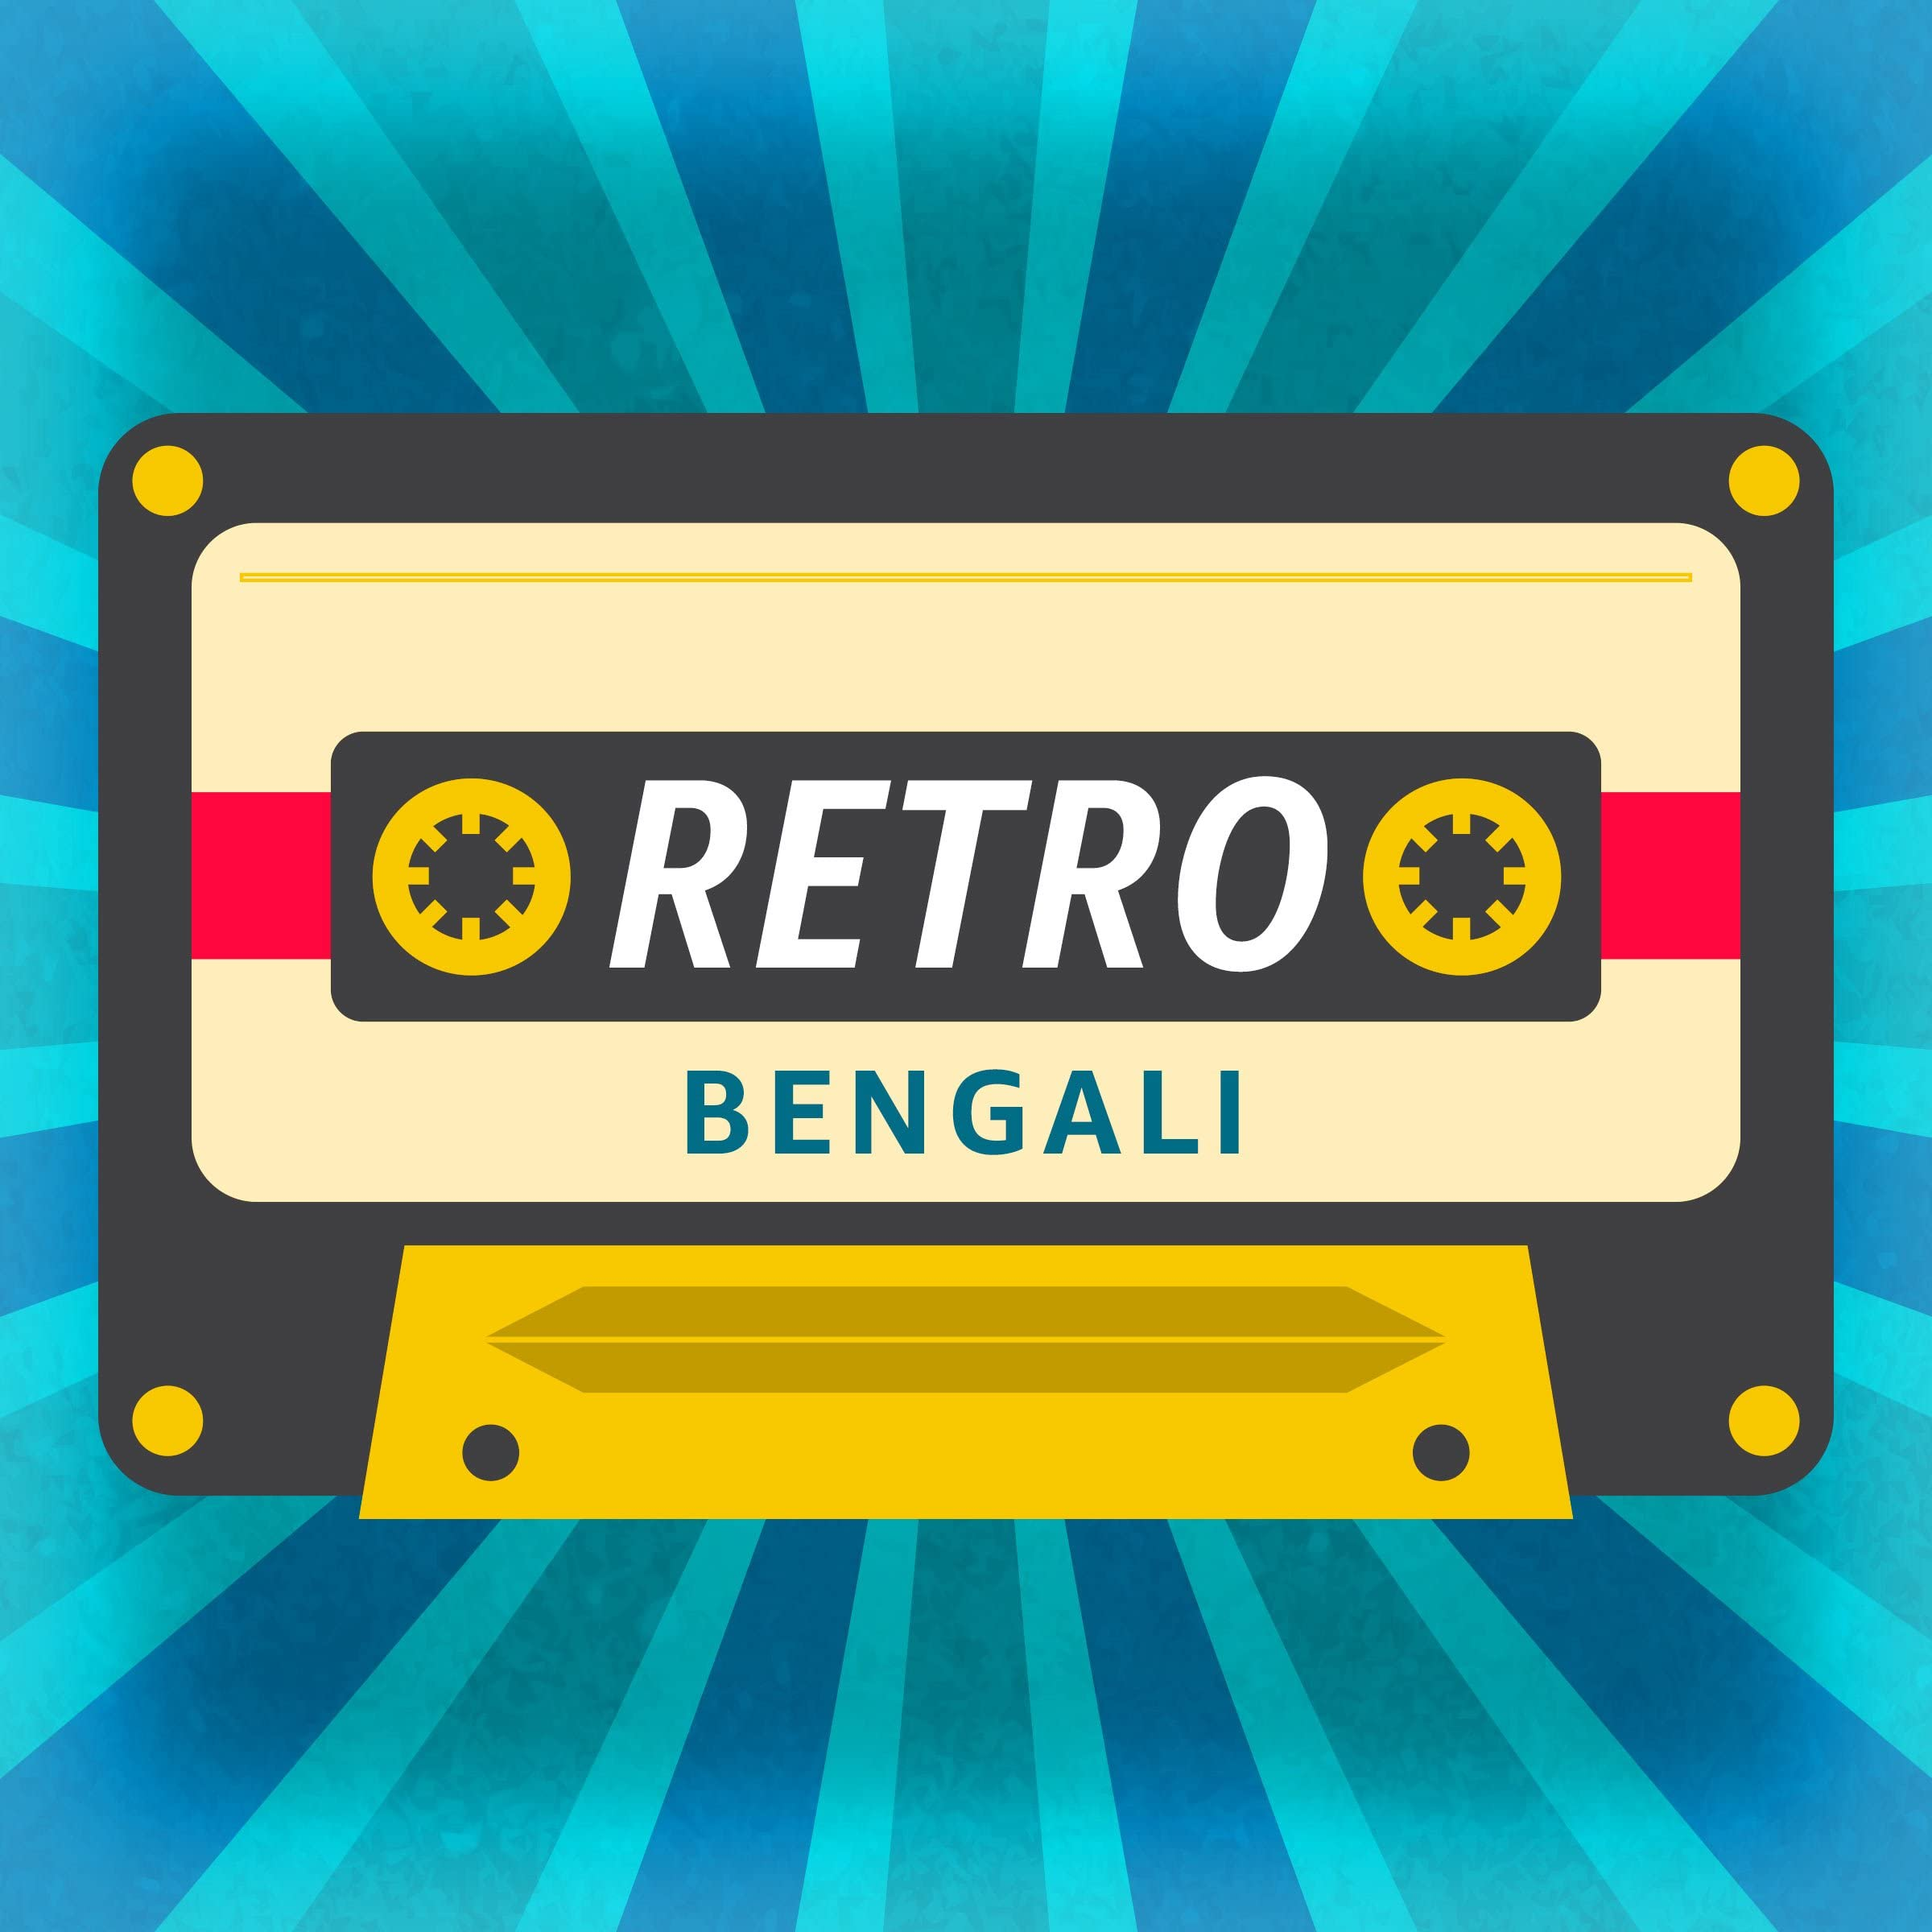 Retro Bengali